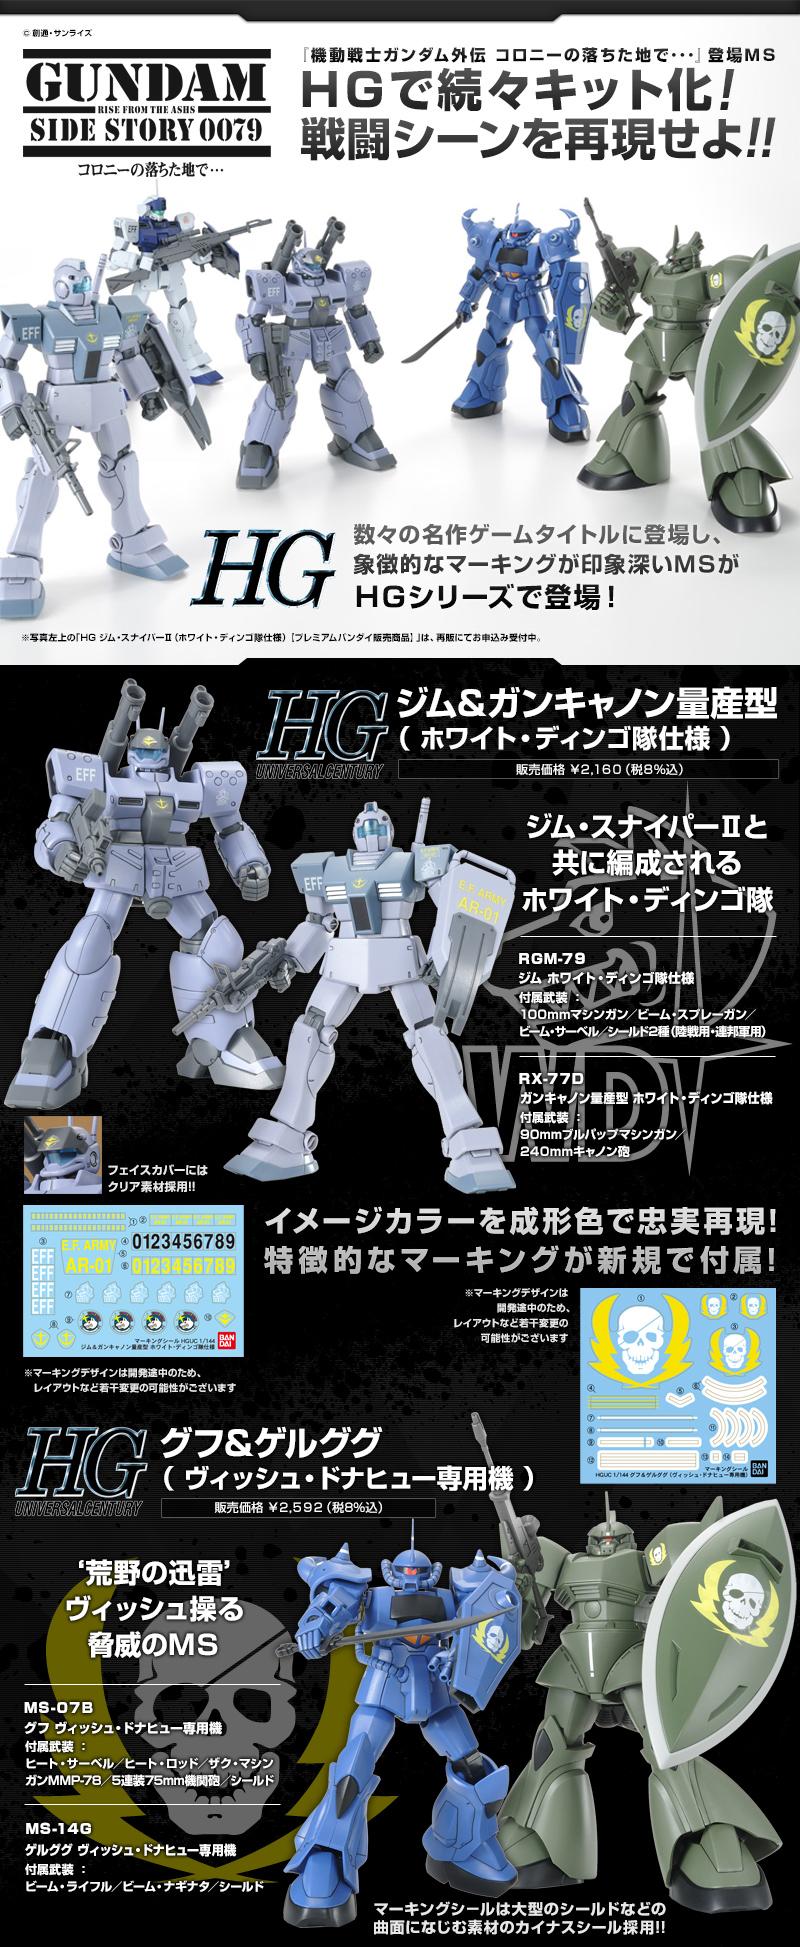 HGUC 1/144 MS-07B グフ & MS-14G ゲルググ(ヴィッシュ・ドナヒュー専用機) 公式商品説明(画像)